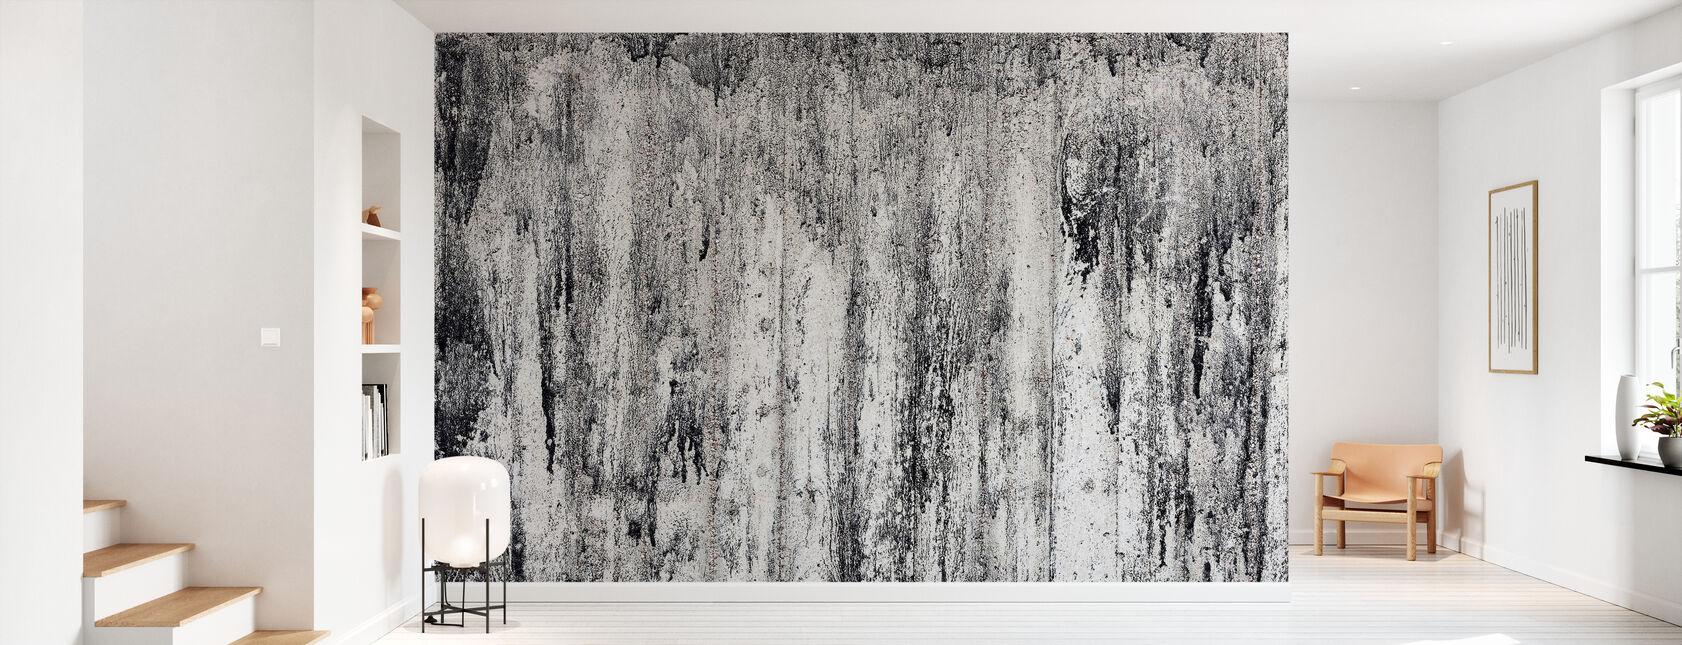 Black Cement Wall - Wallpaper - Hallway